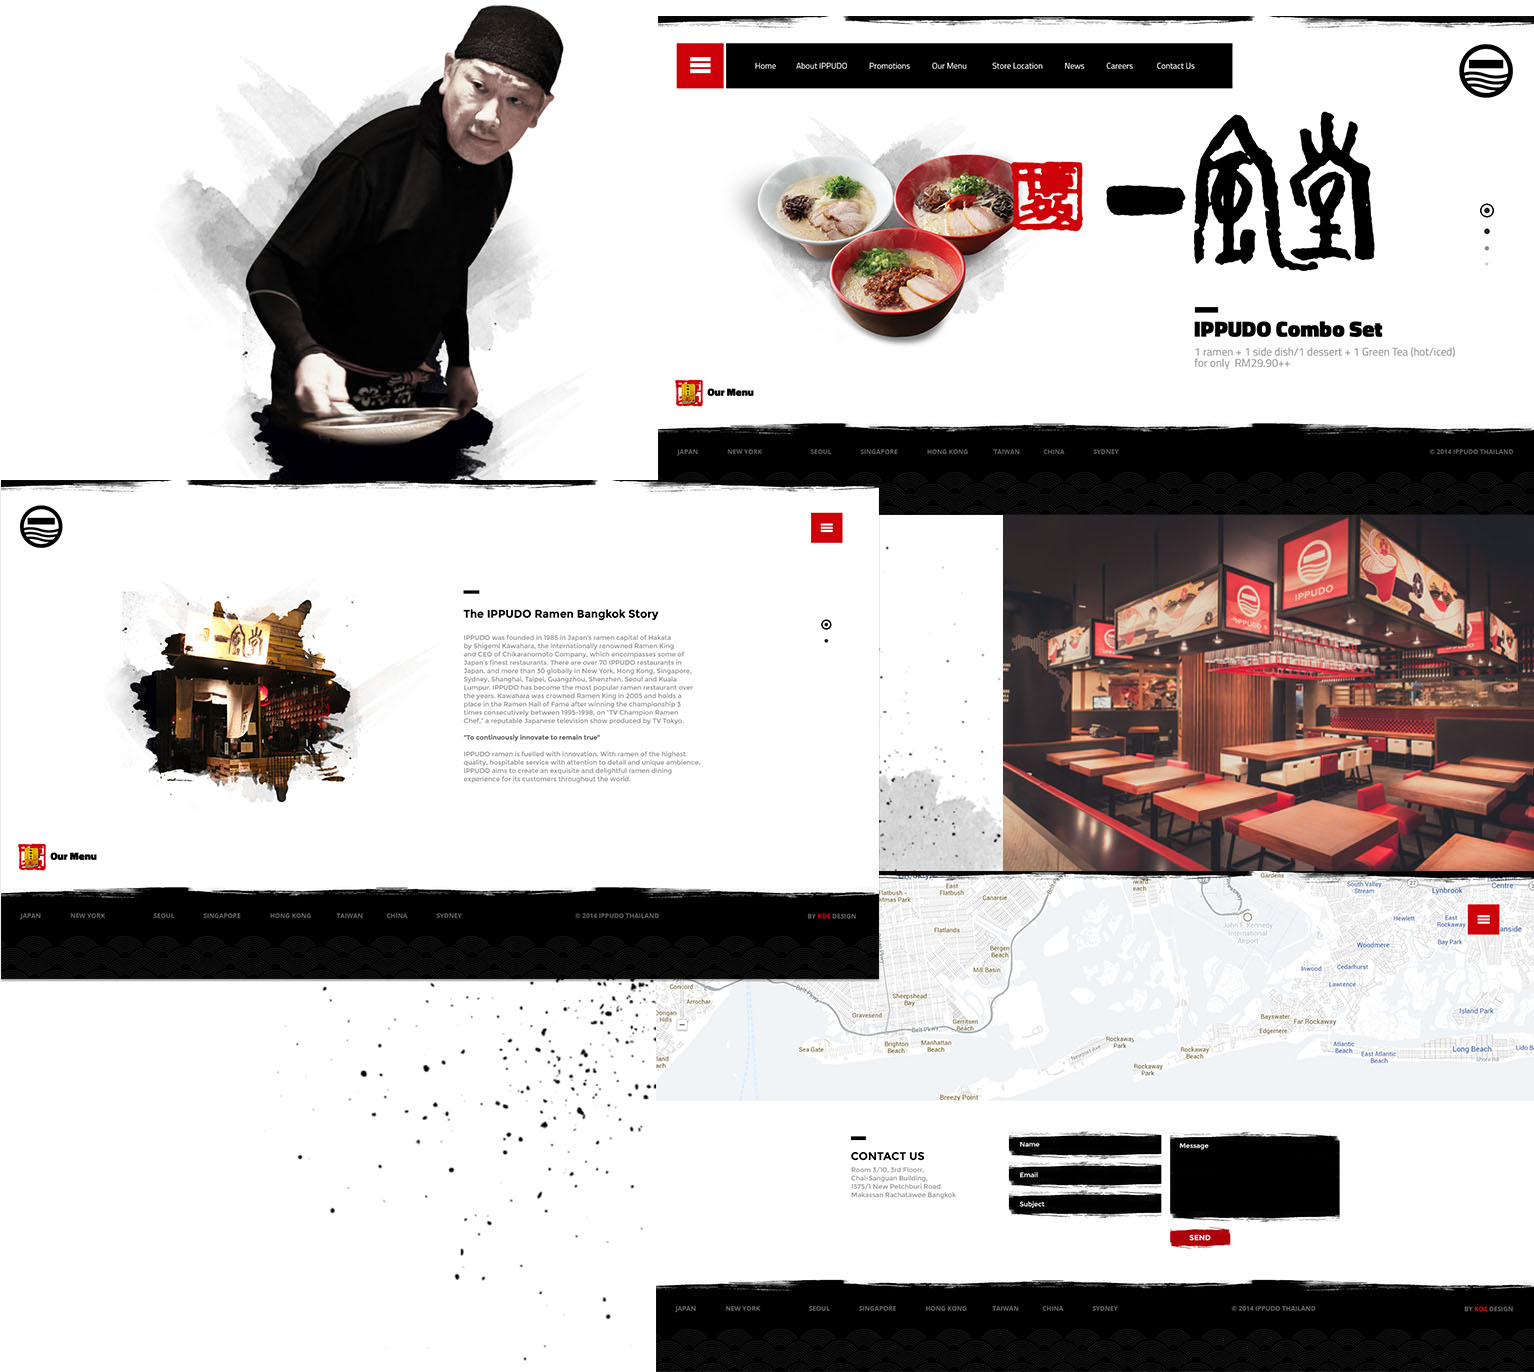 KOS Design - IPPUDO